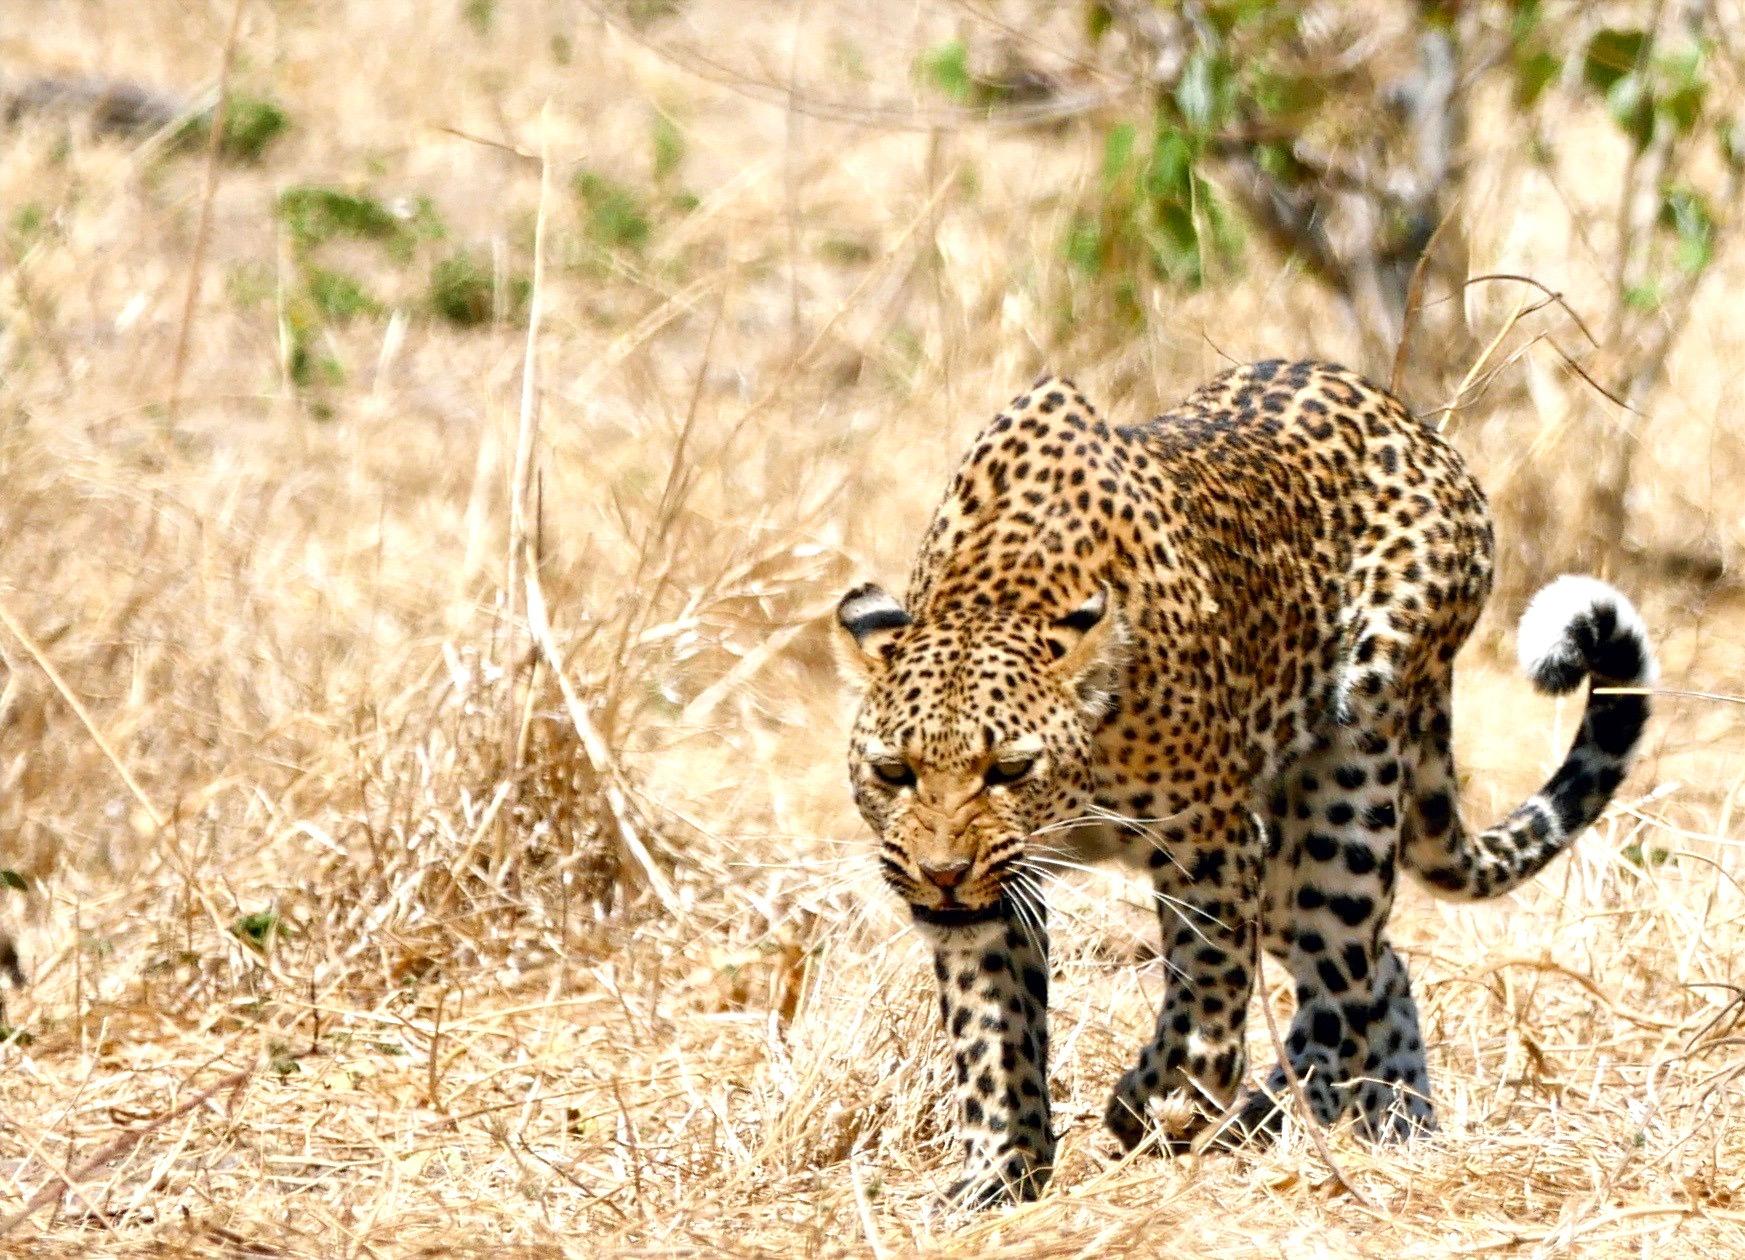 Leopard Chobe National Park